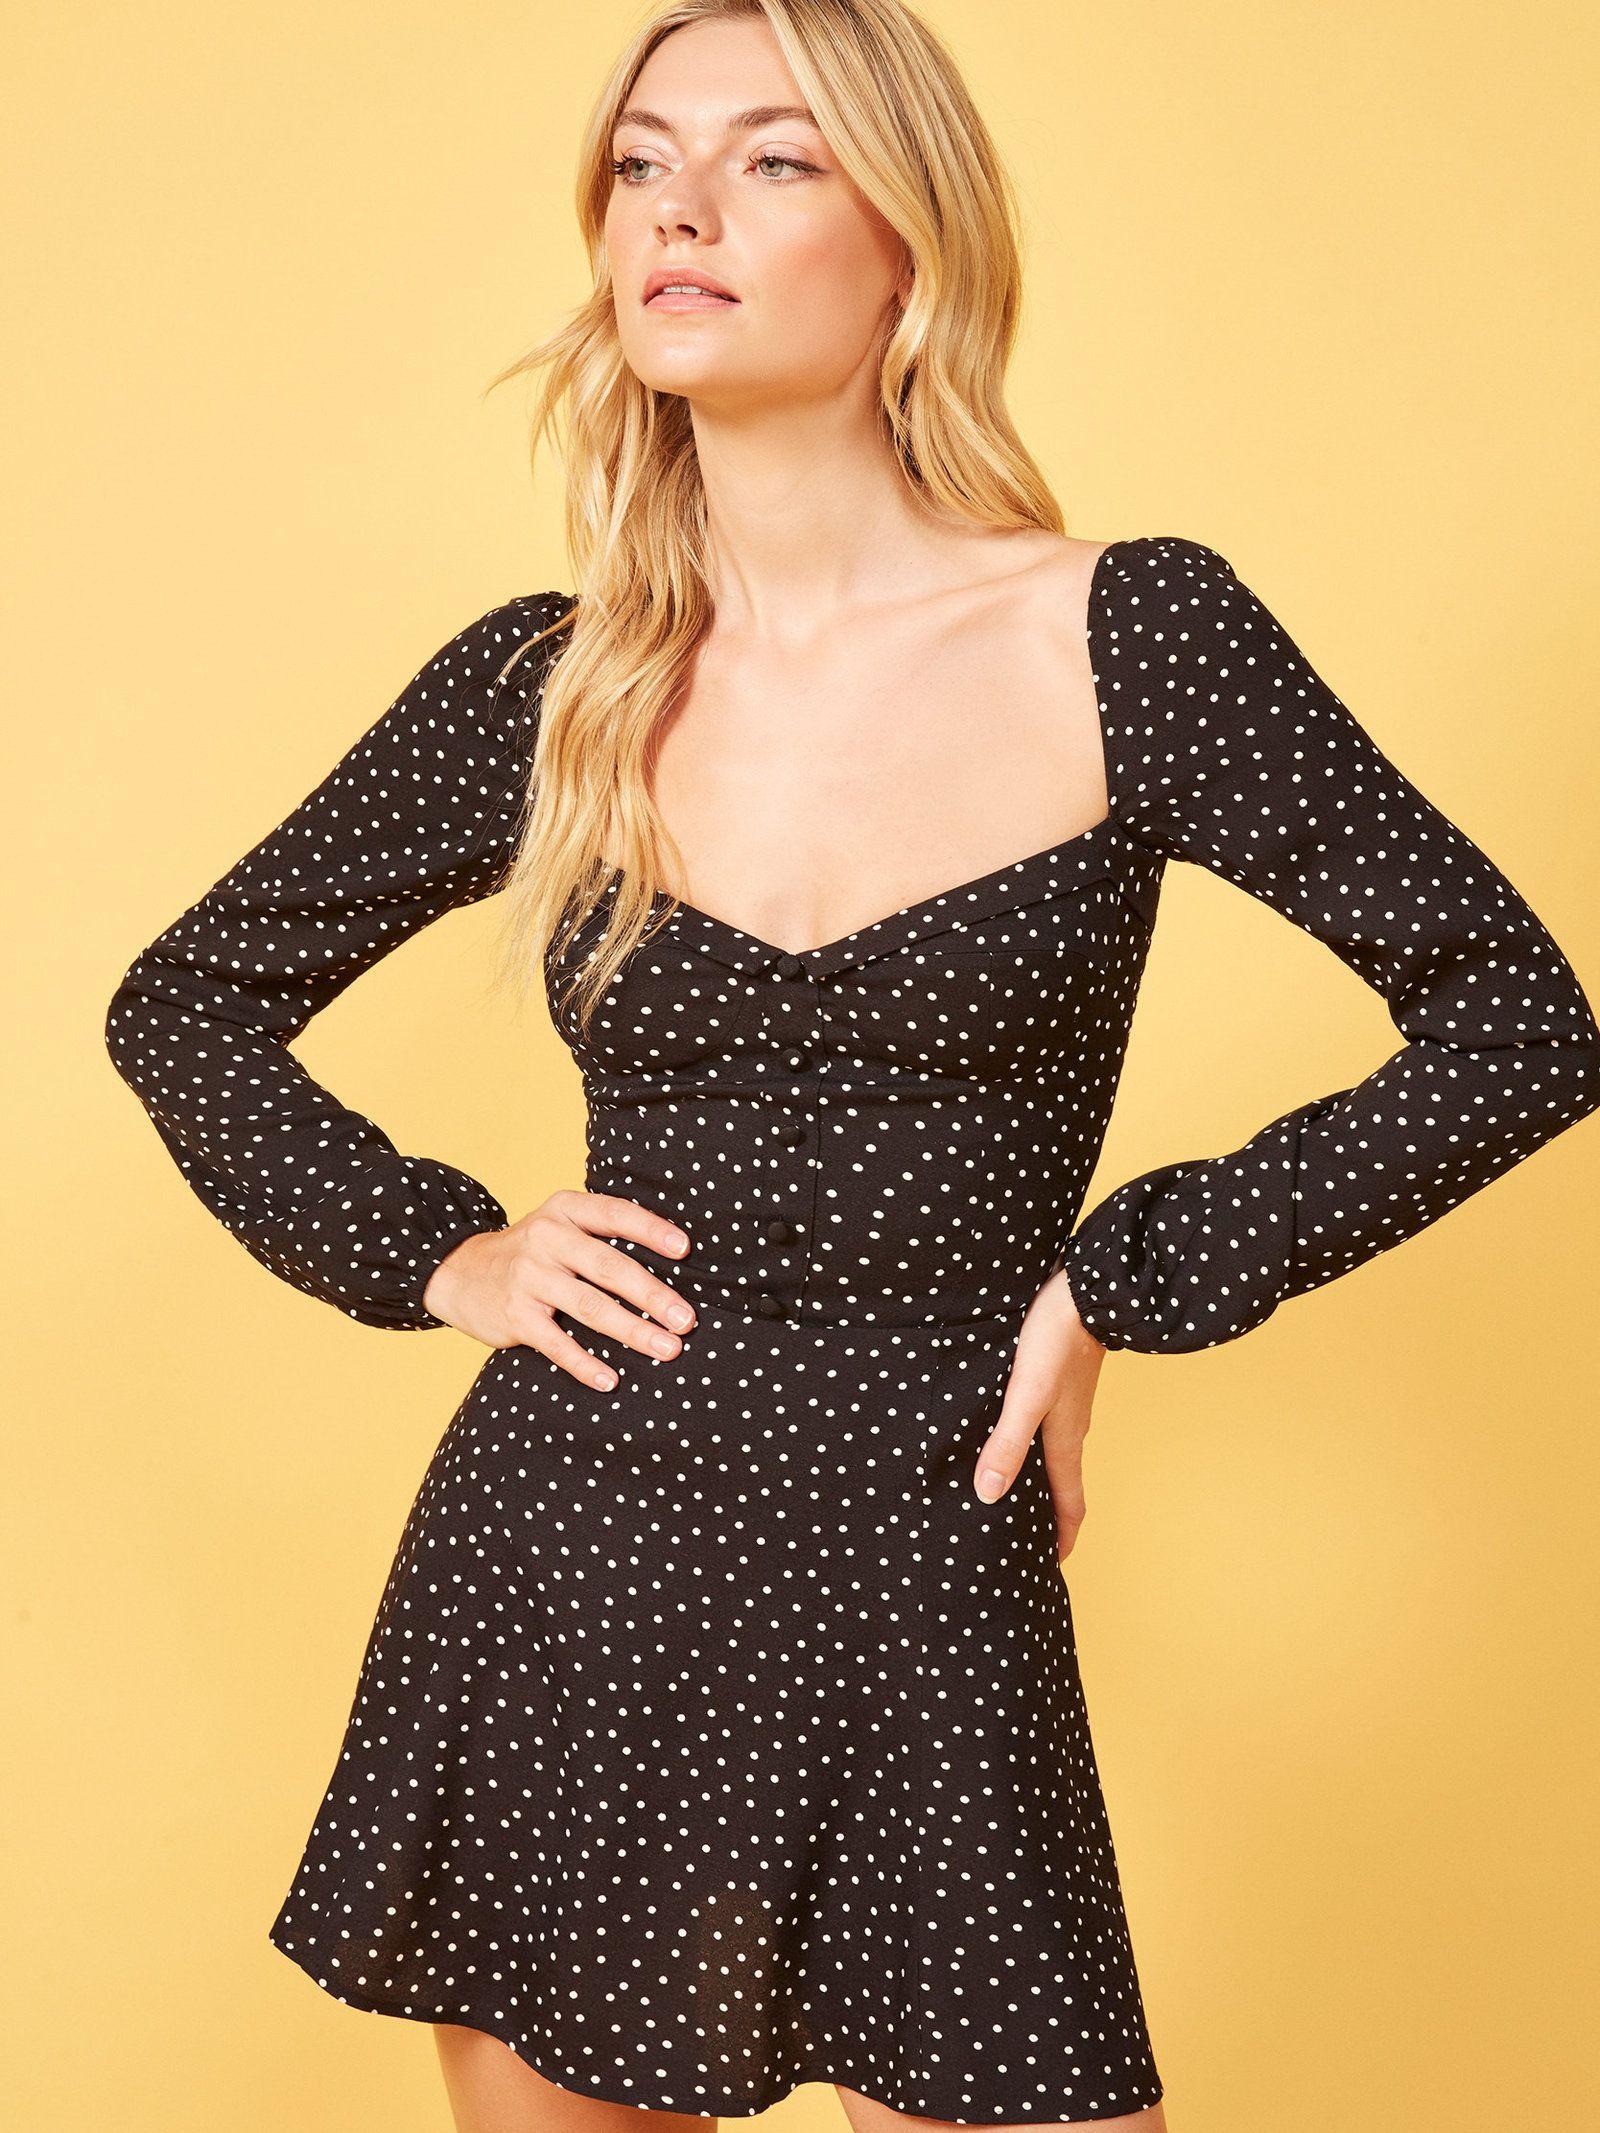 33427e780d73 The Lucia Dress | Dresses in 2019 | Fashion, Dresses, Fashion outfits